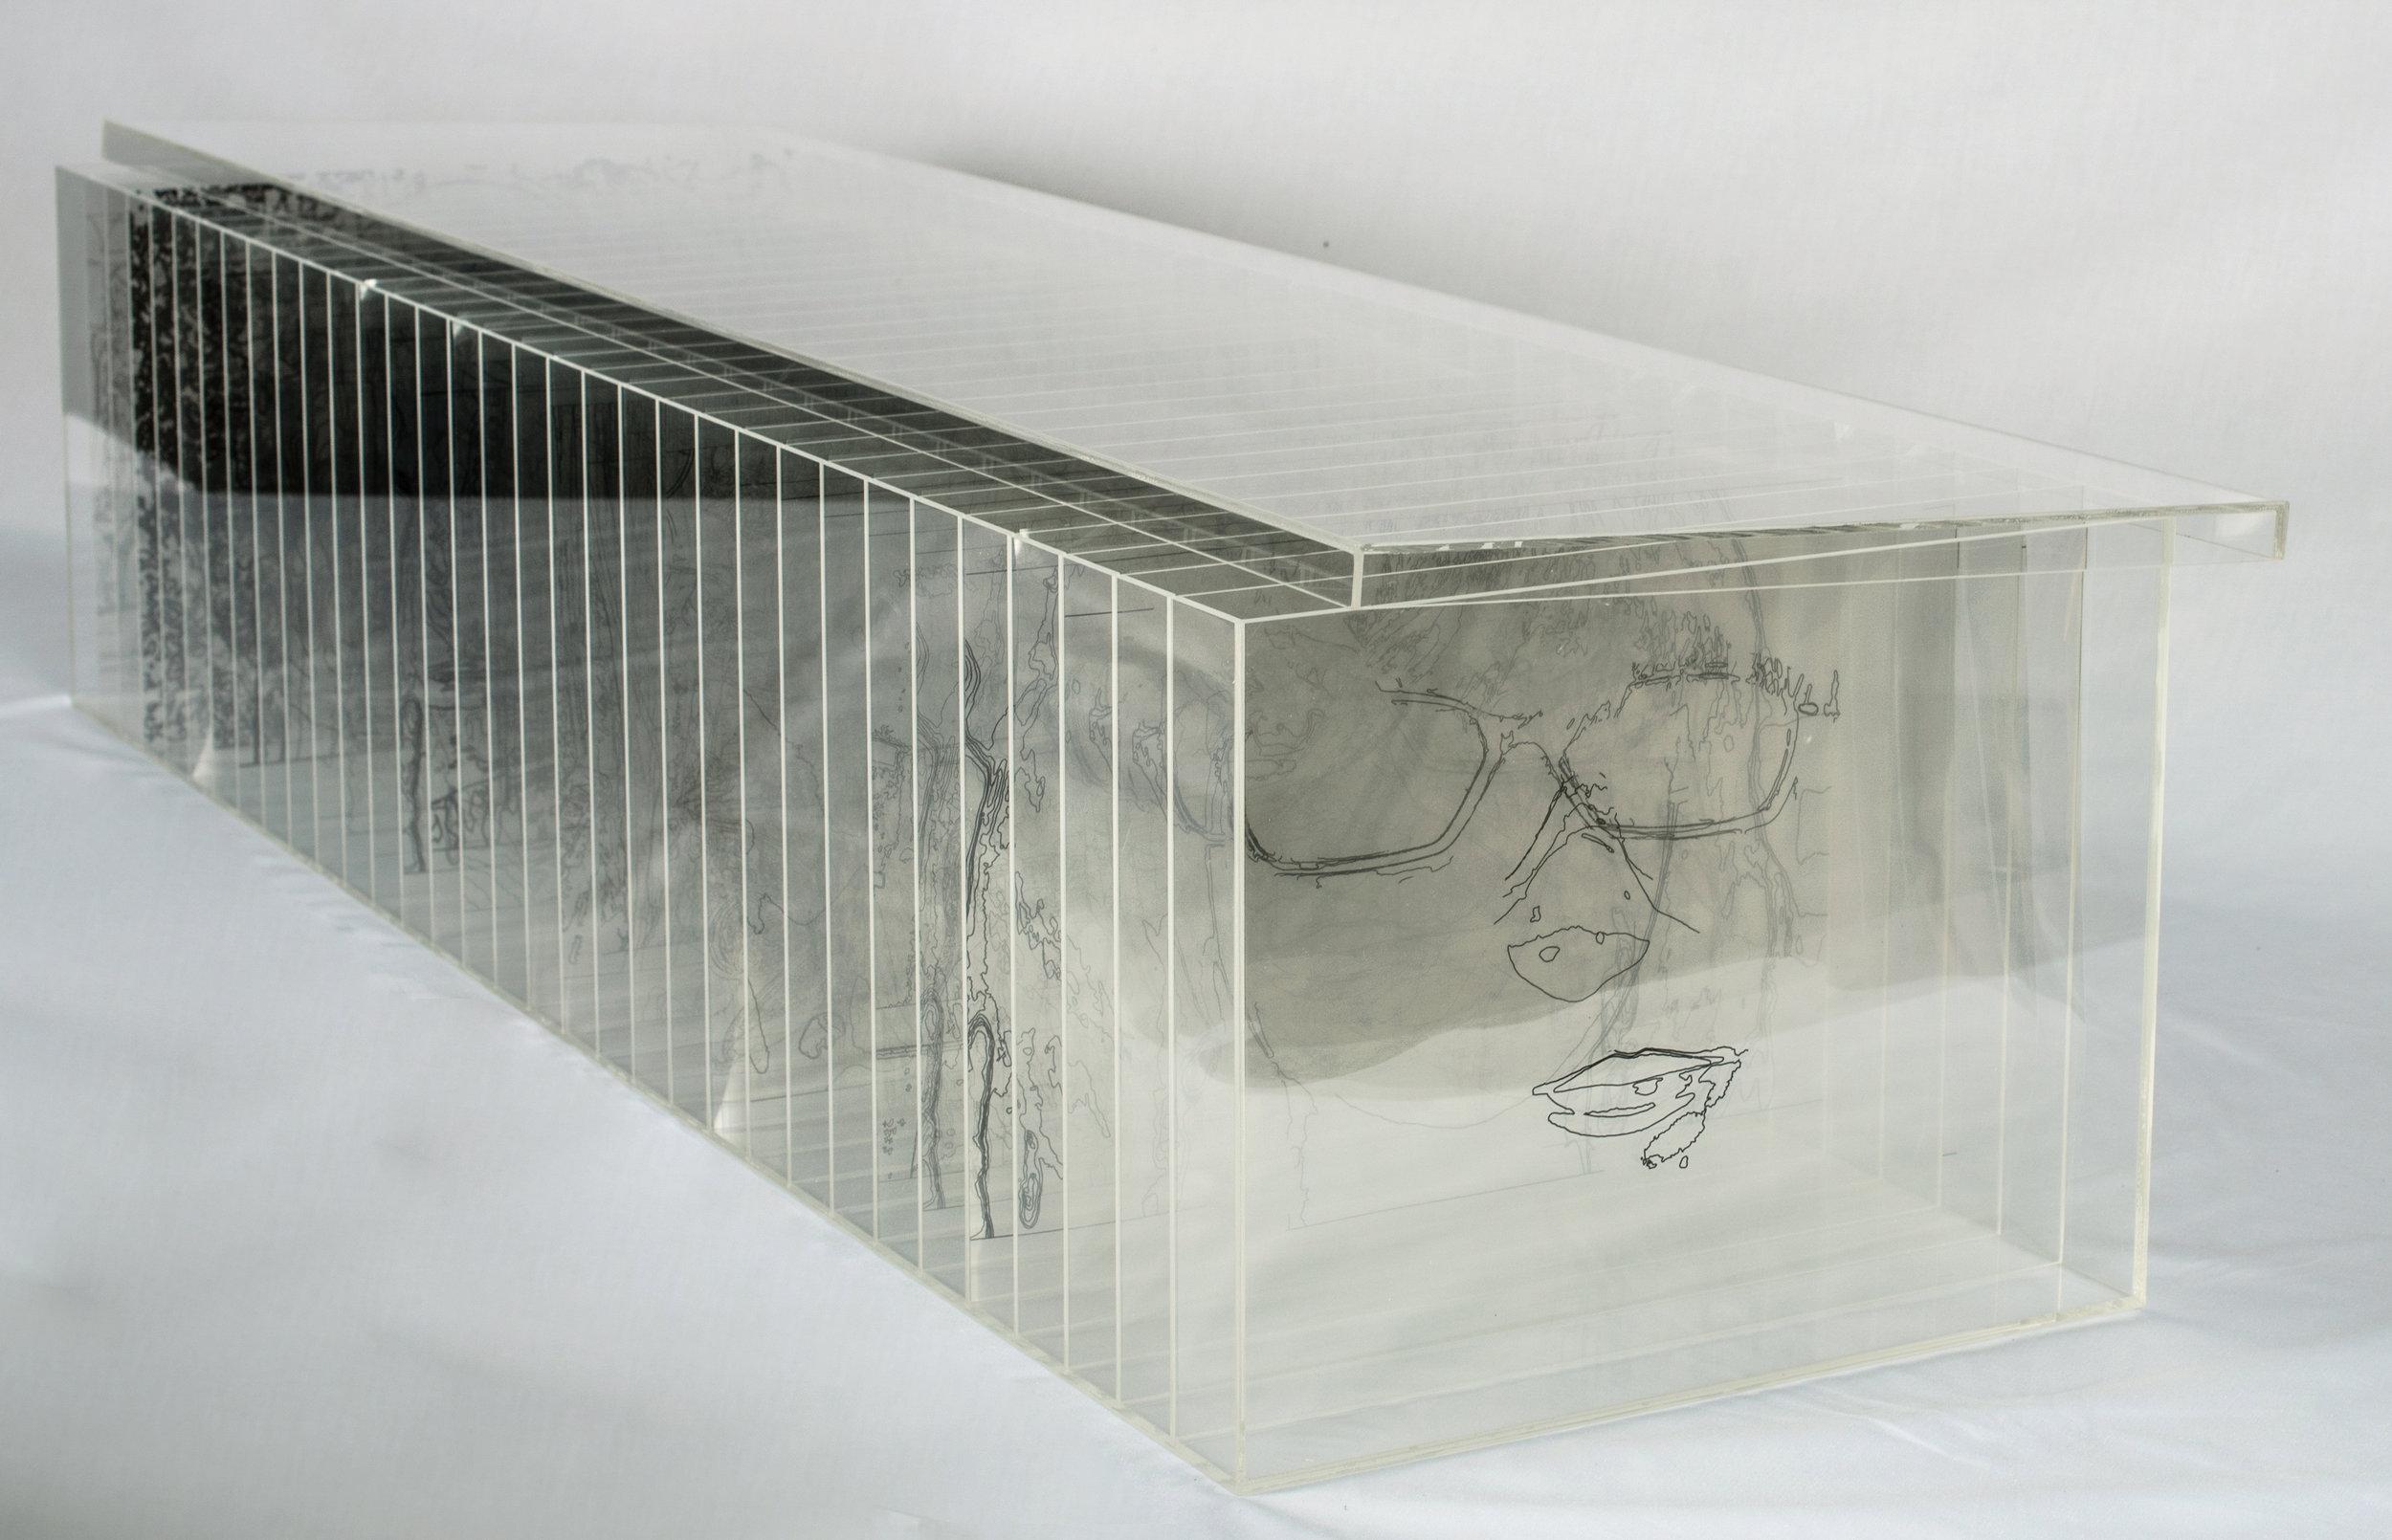 Polymer acrylic, acetate, ink   40 x 38 cm   2015